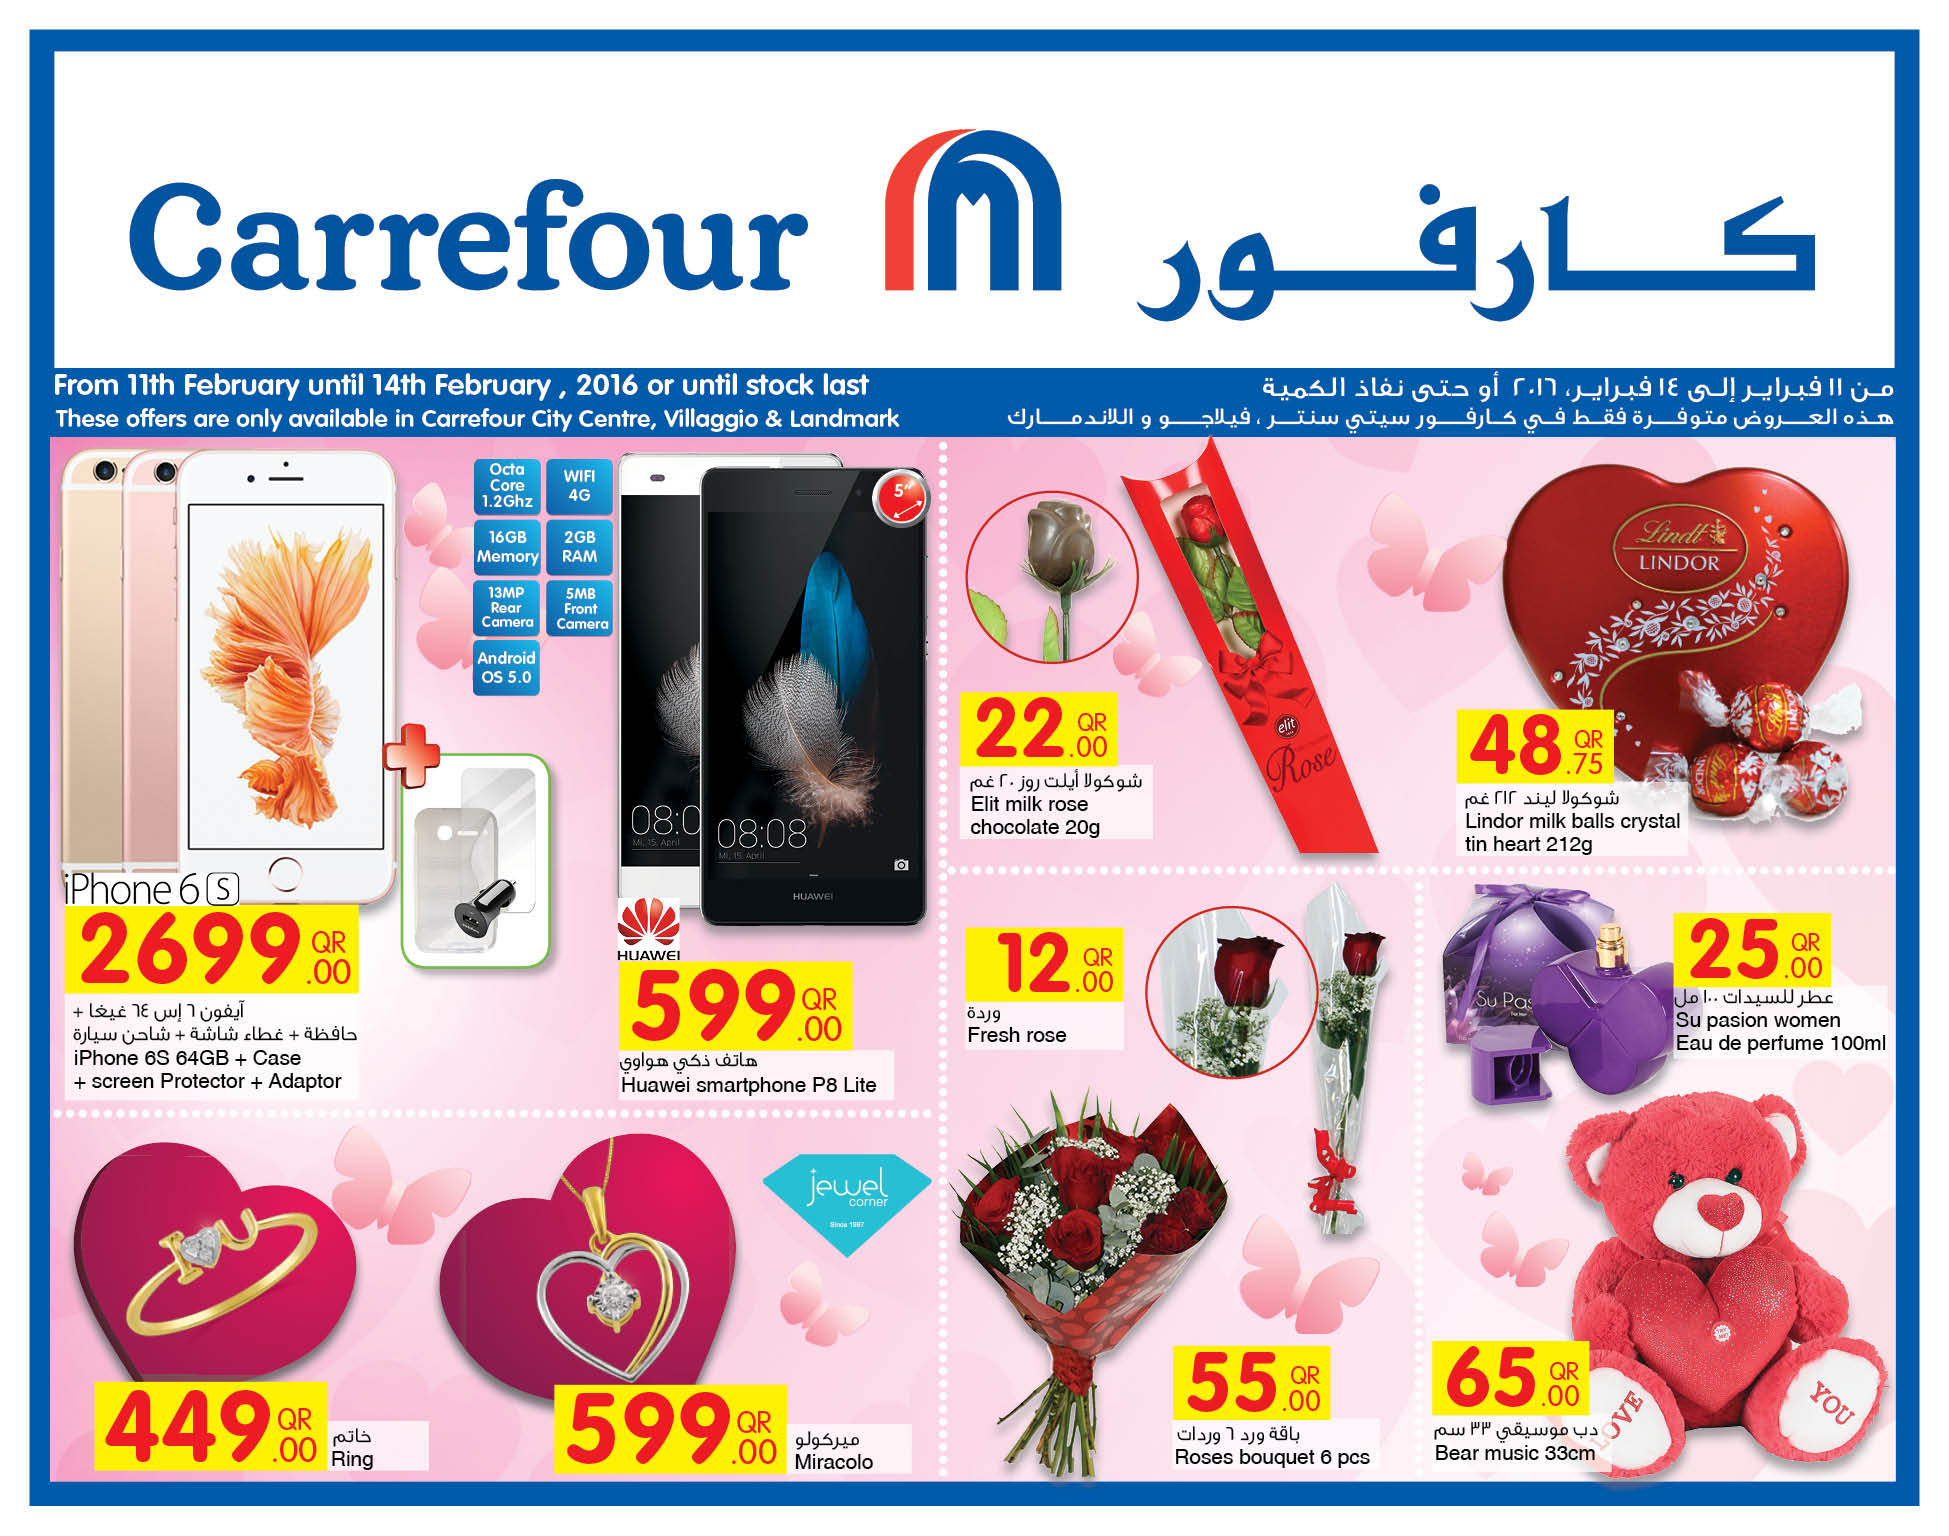 carrefour we 11 02 qatar i discounts